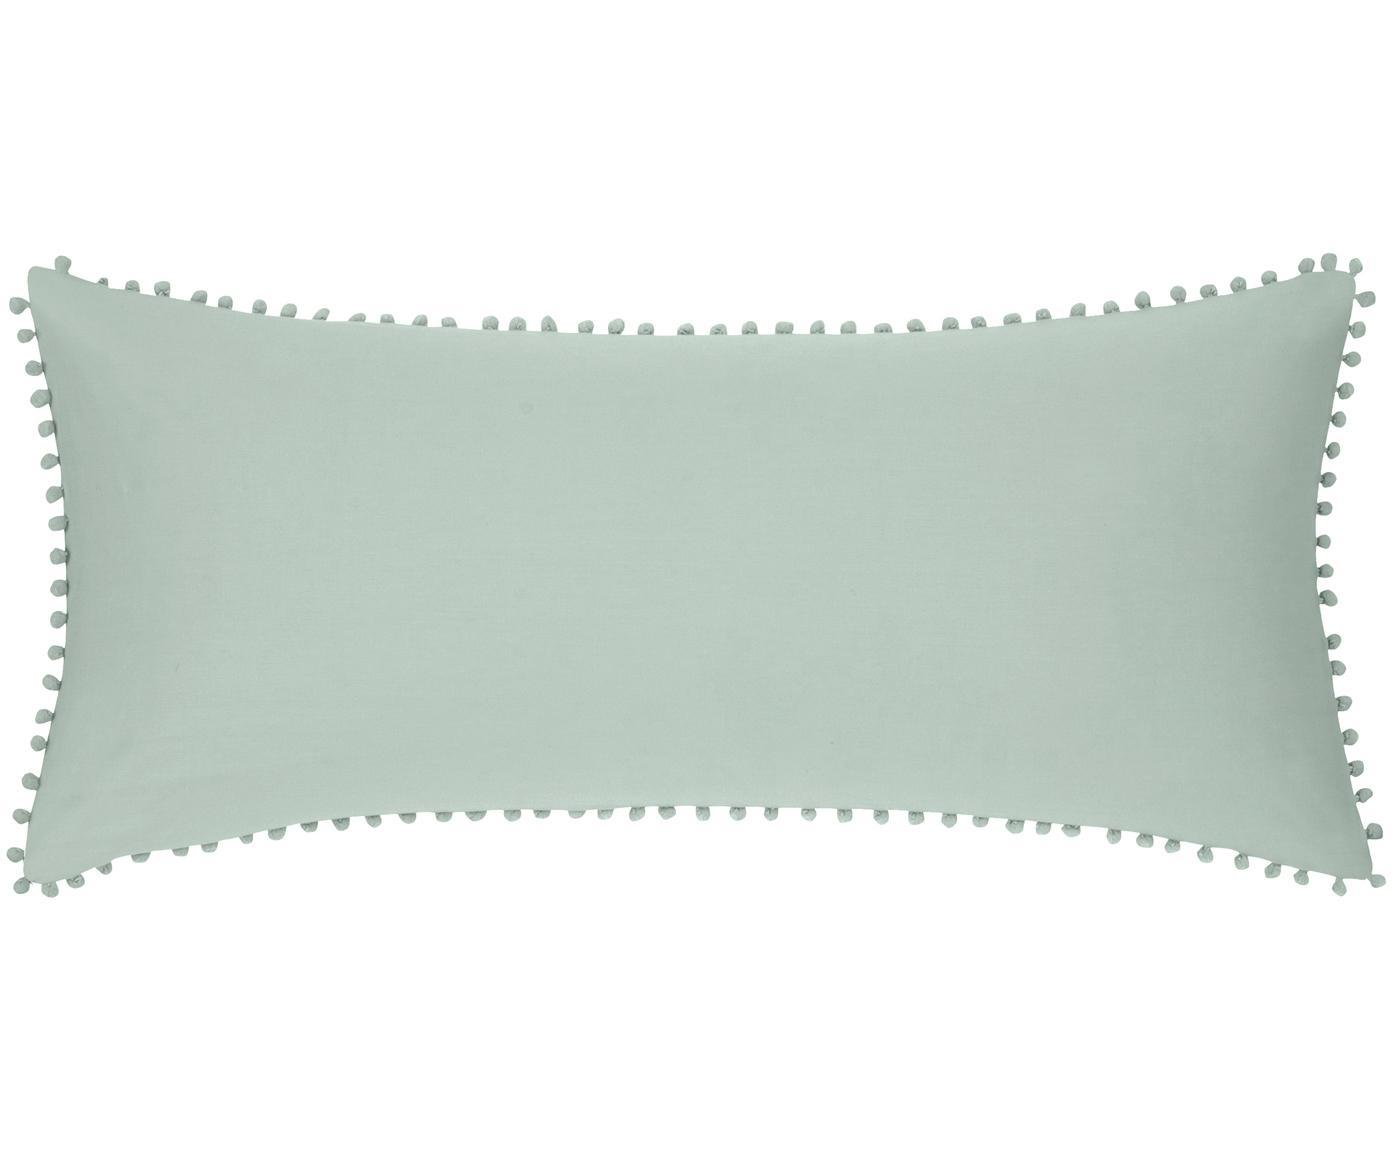 Baumwollperkal-Kissenbezüge Bommy mit Pompoms, 2 Stück, Webart: Perkal Fadendichte 200 TC, Salbeigrün, 40 x 80 cm